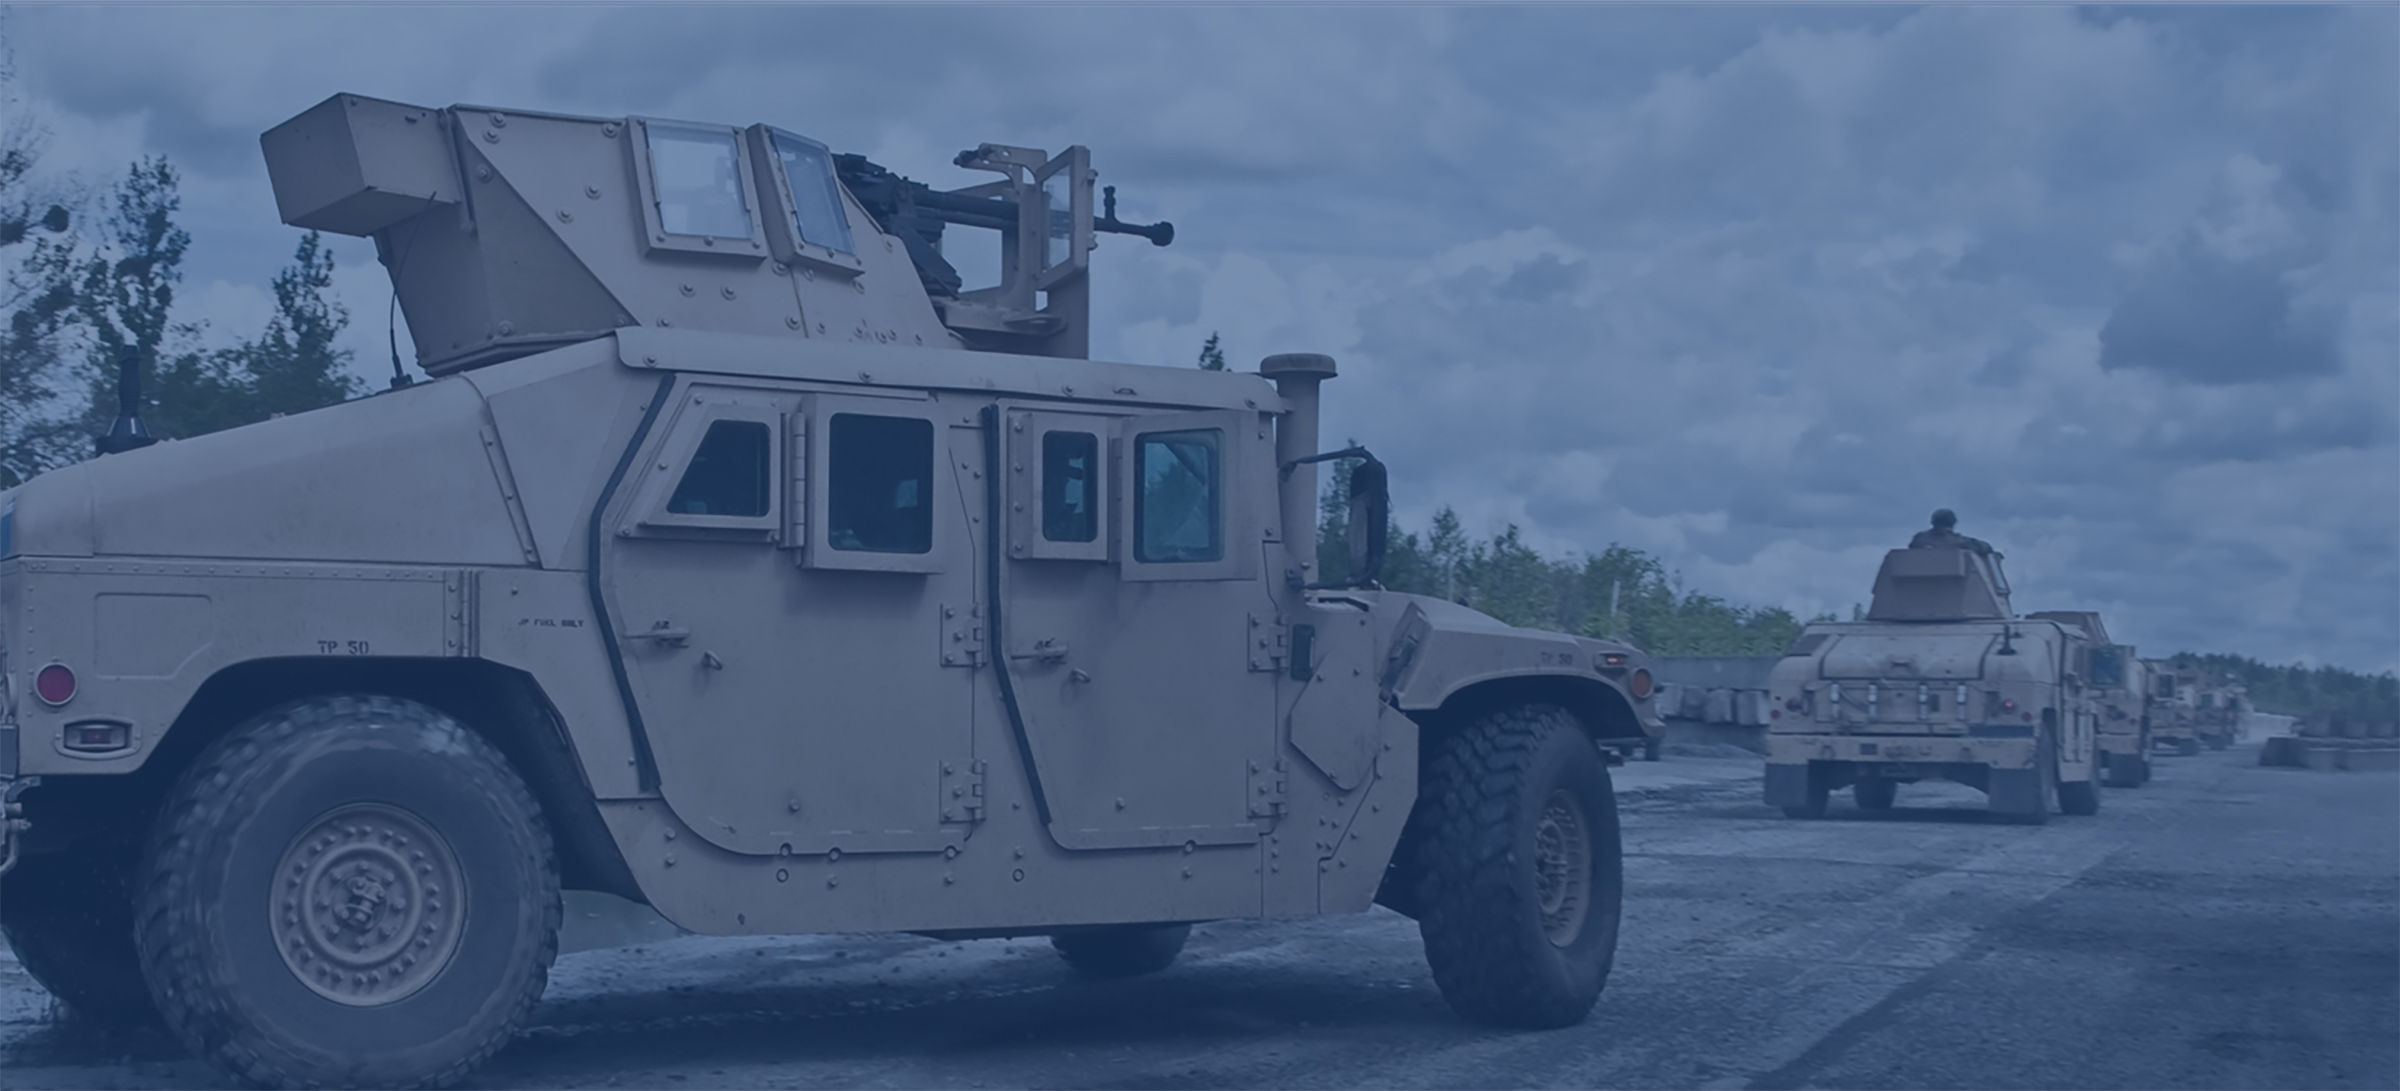 Humvee Slider